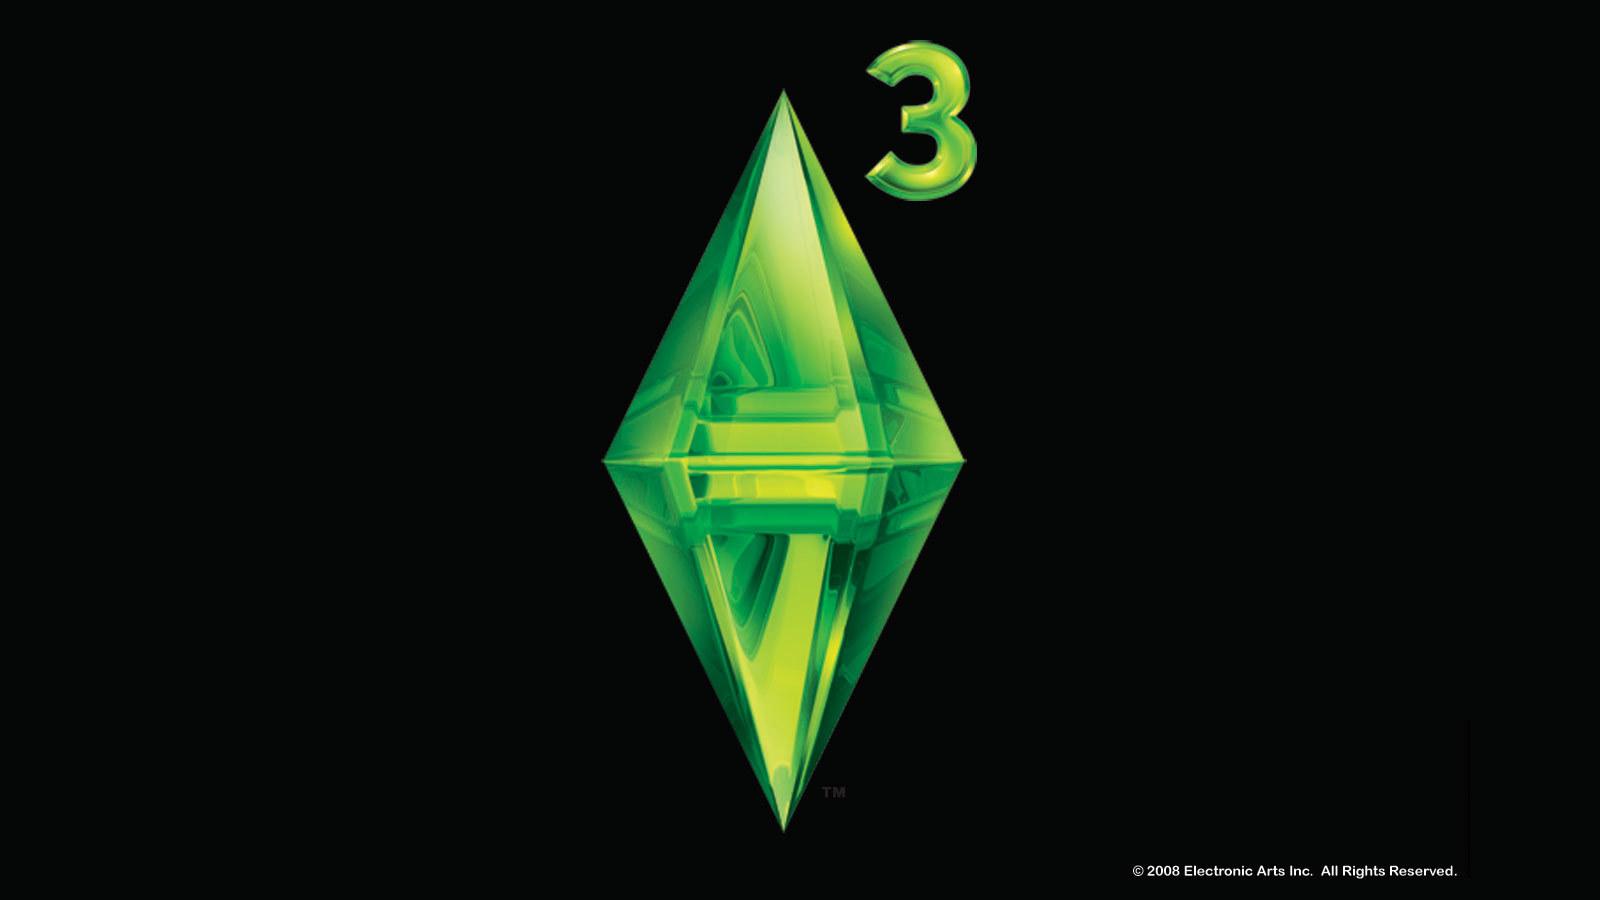 The Sims 3 wallpaper - The Sims 3 Wallpaper (6549684) - Fanpop